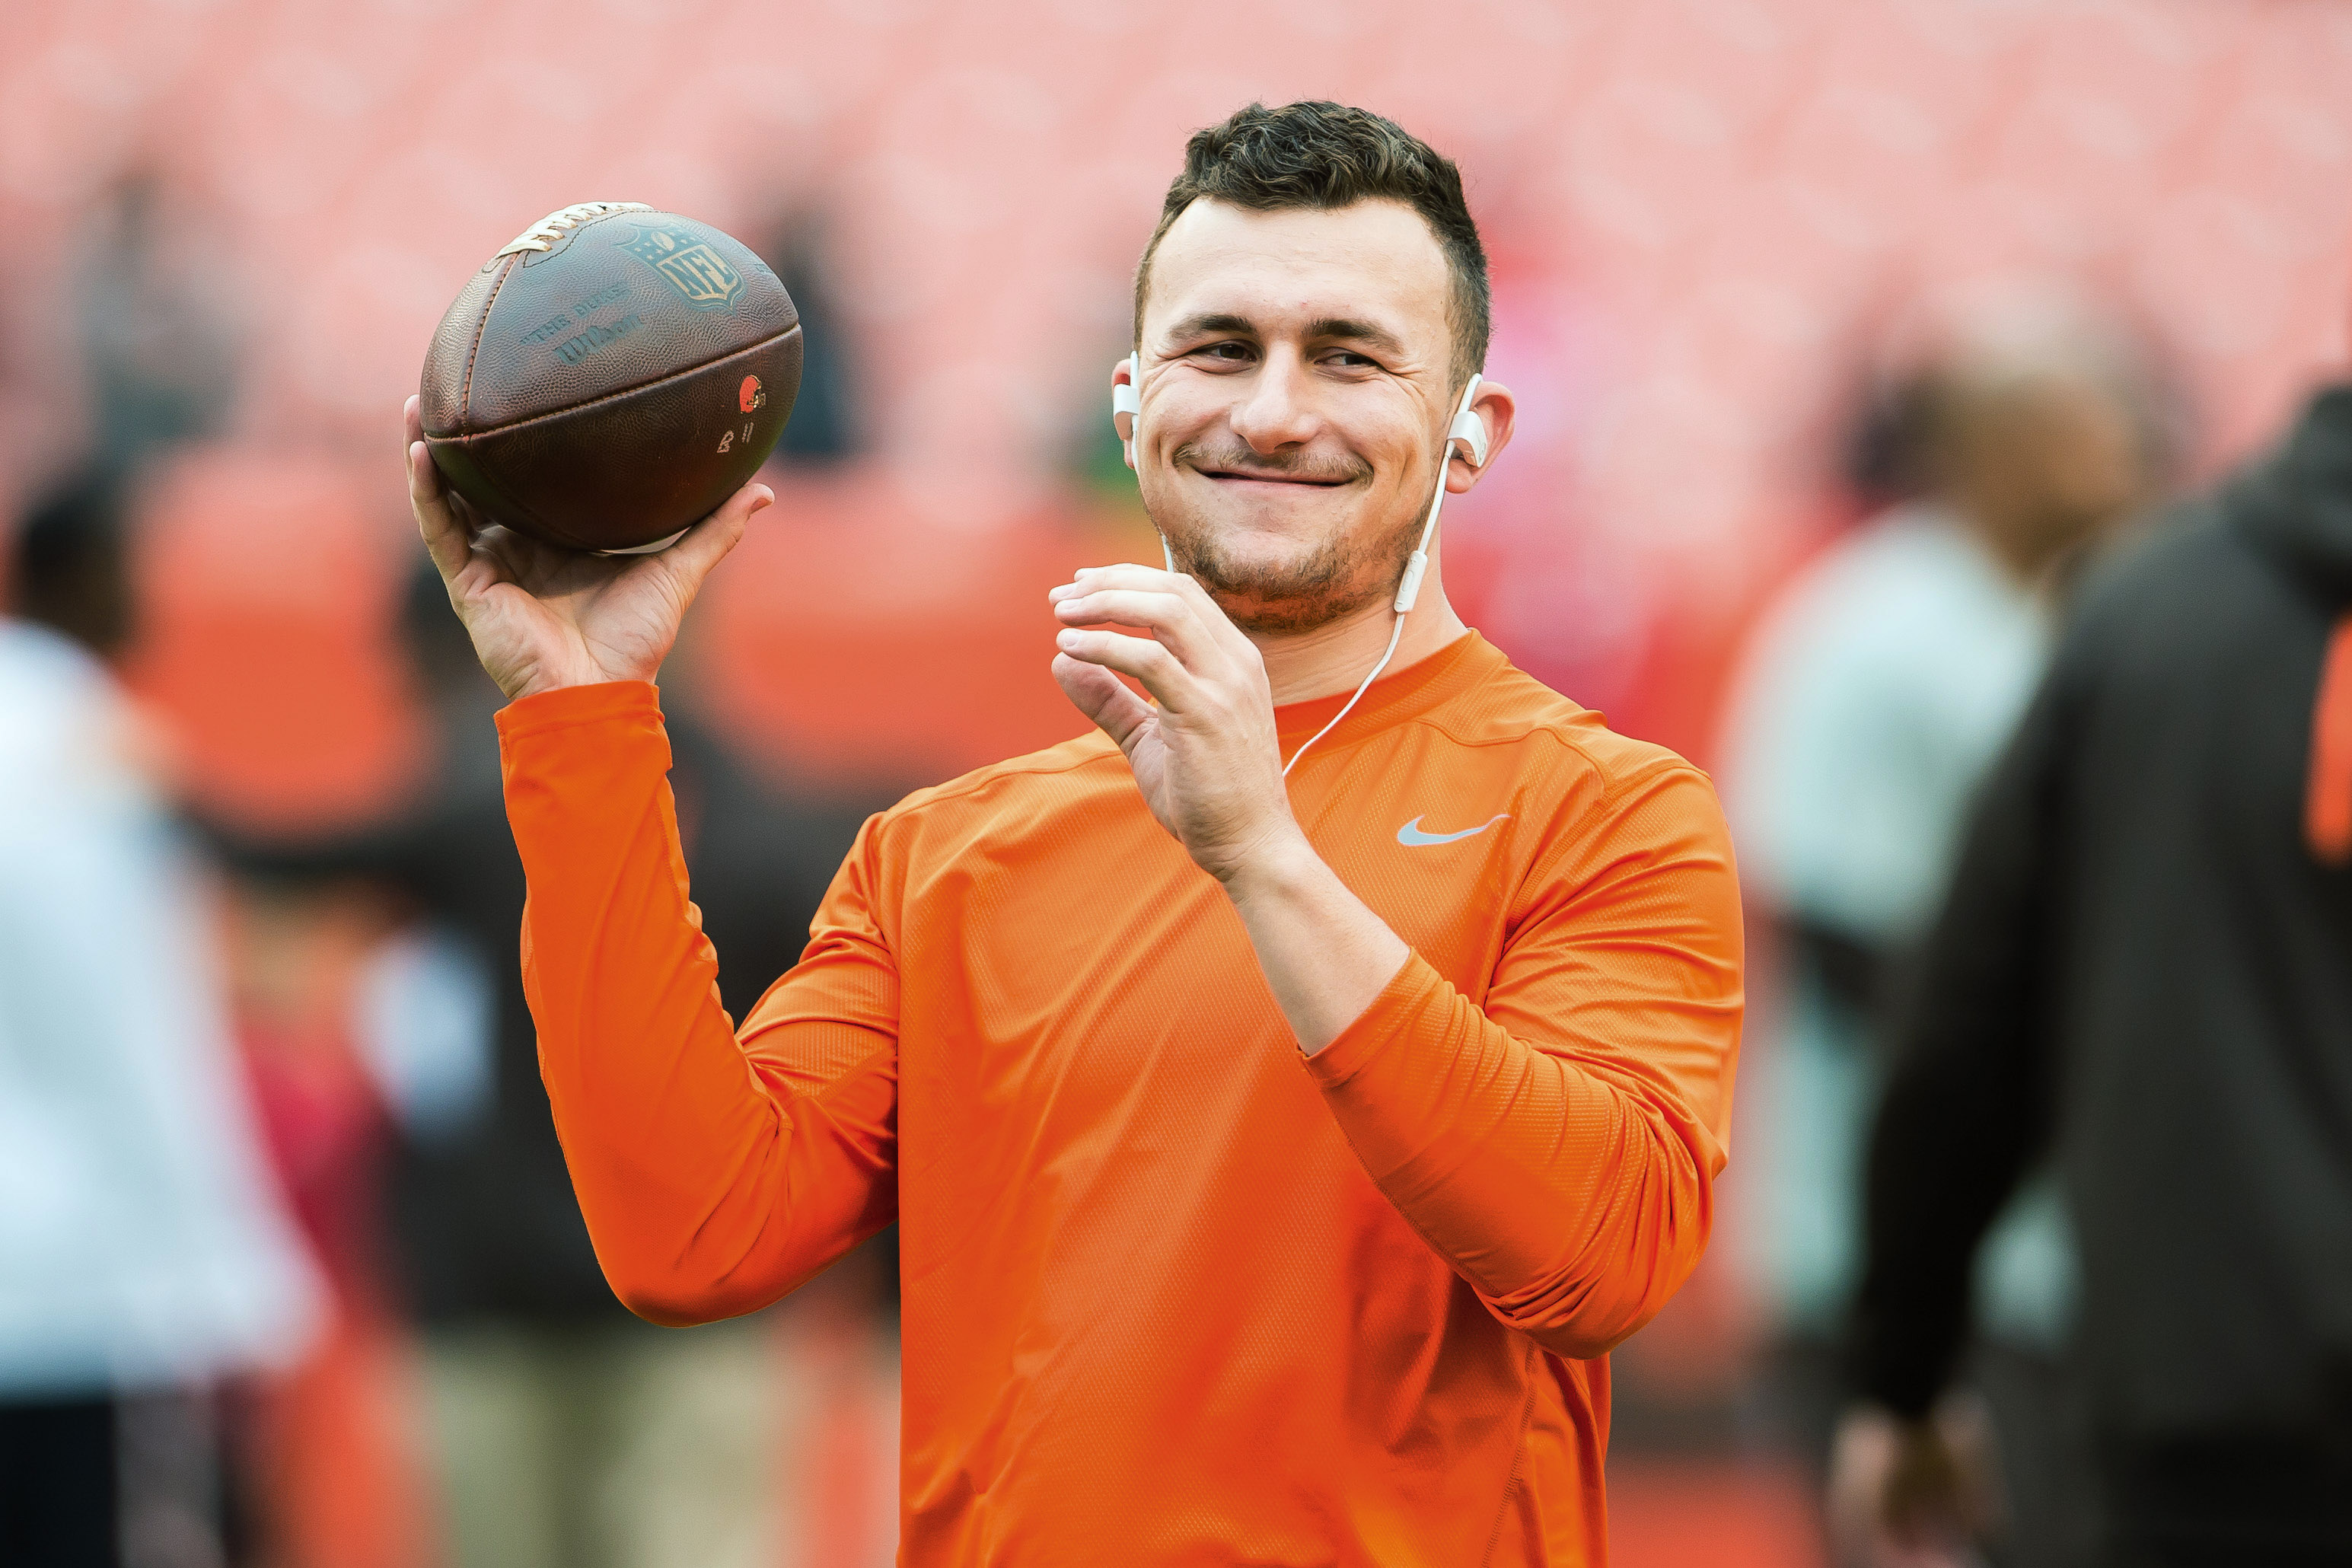 Johnny Manziel Bipolaridad Trastorno NFL Quarterback